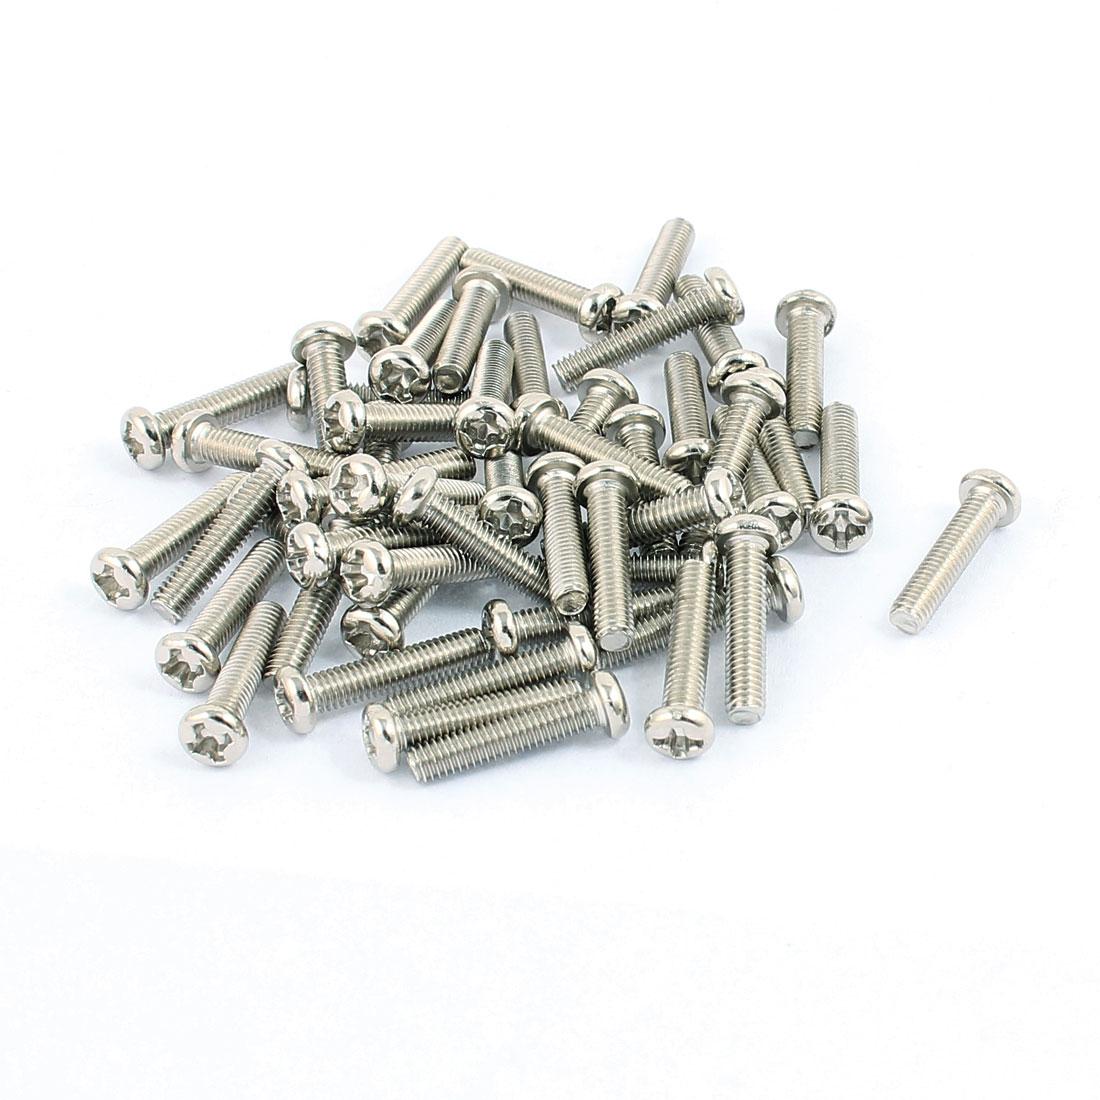 50 Pcs M3x14mm Stainless Steel Round Head Phillips Machine Screws Bolts